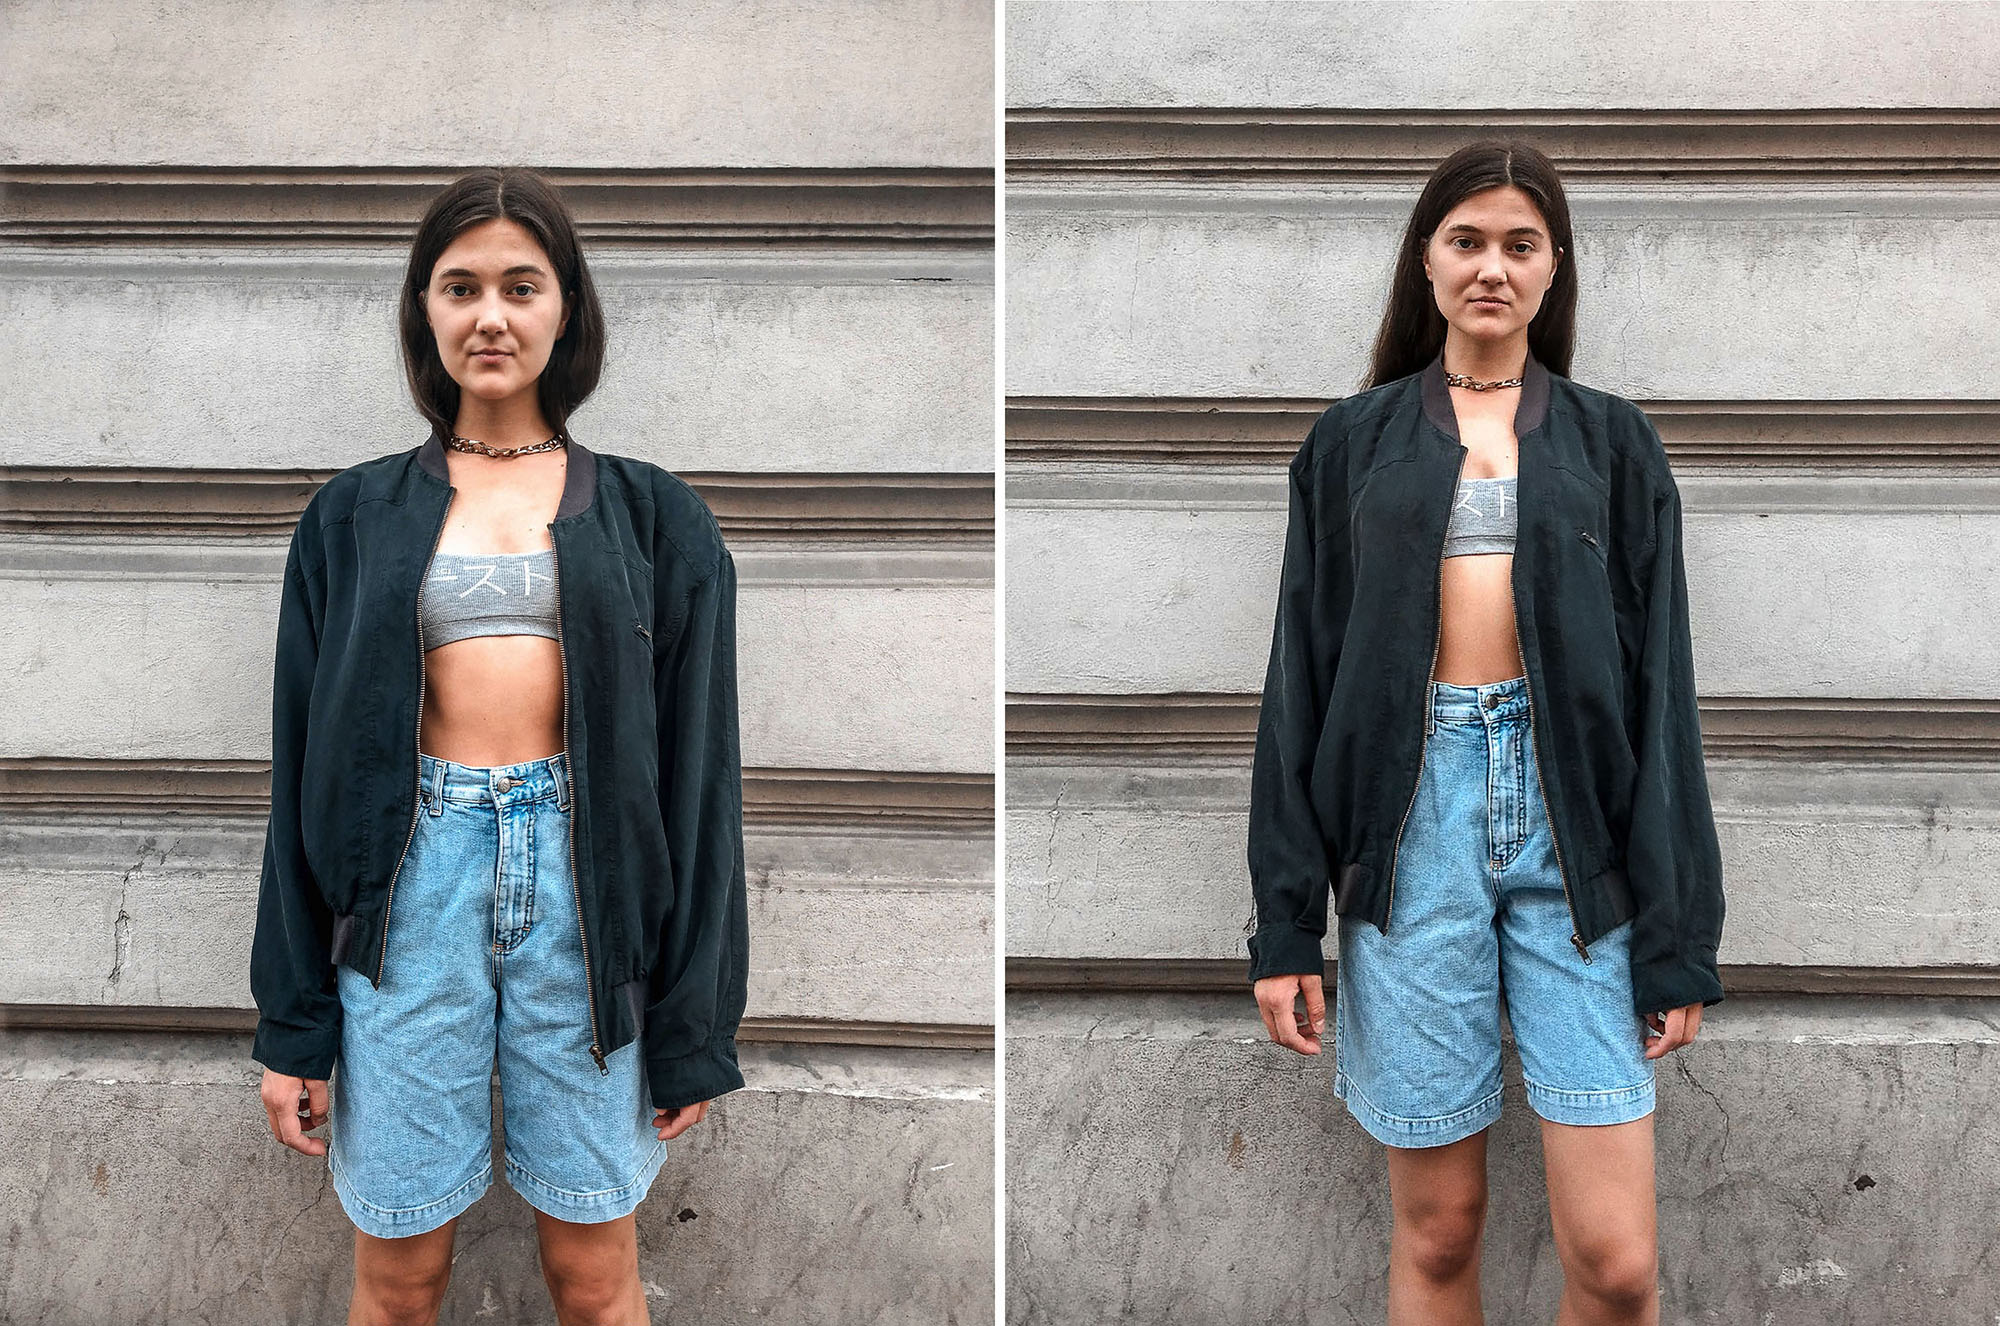 before and after: Schulterpolster entfernen aus Vintage 80er Jahre Jacken wie zB. Seidenbomber, Lederbomber